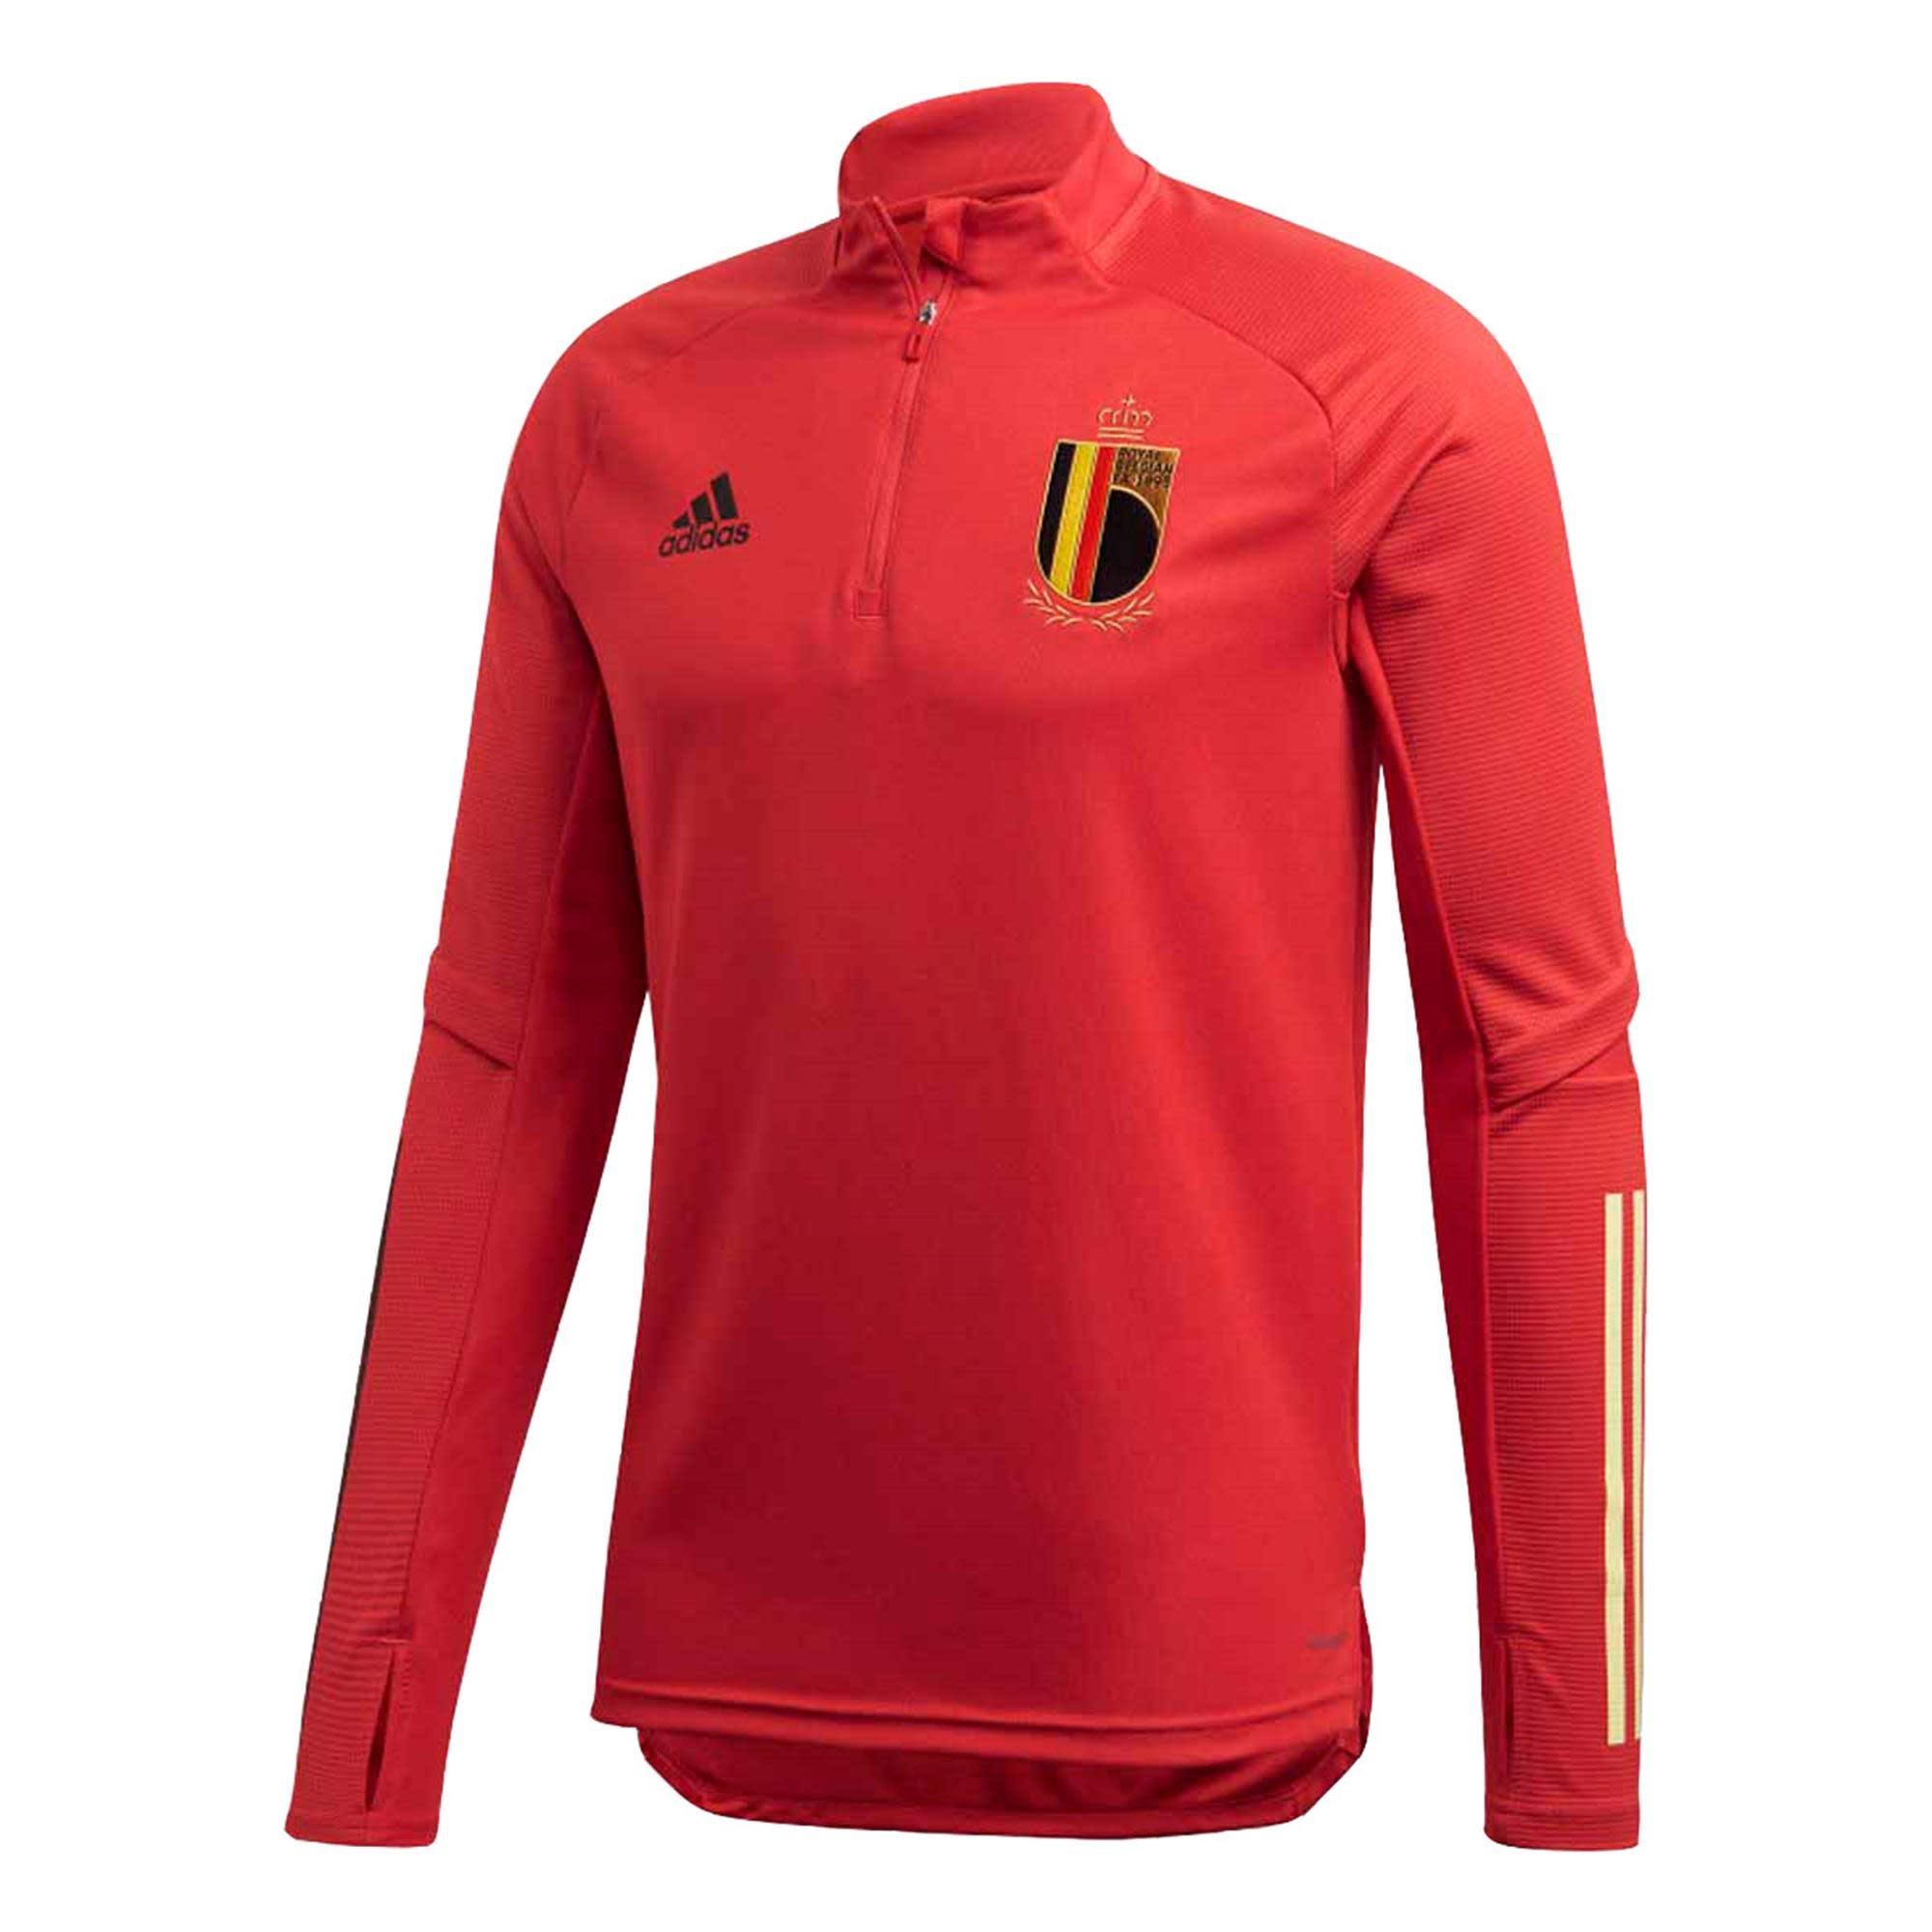 Adidas ADIDAS Belgium Training Top